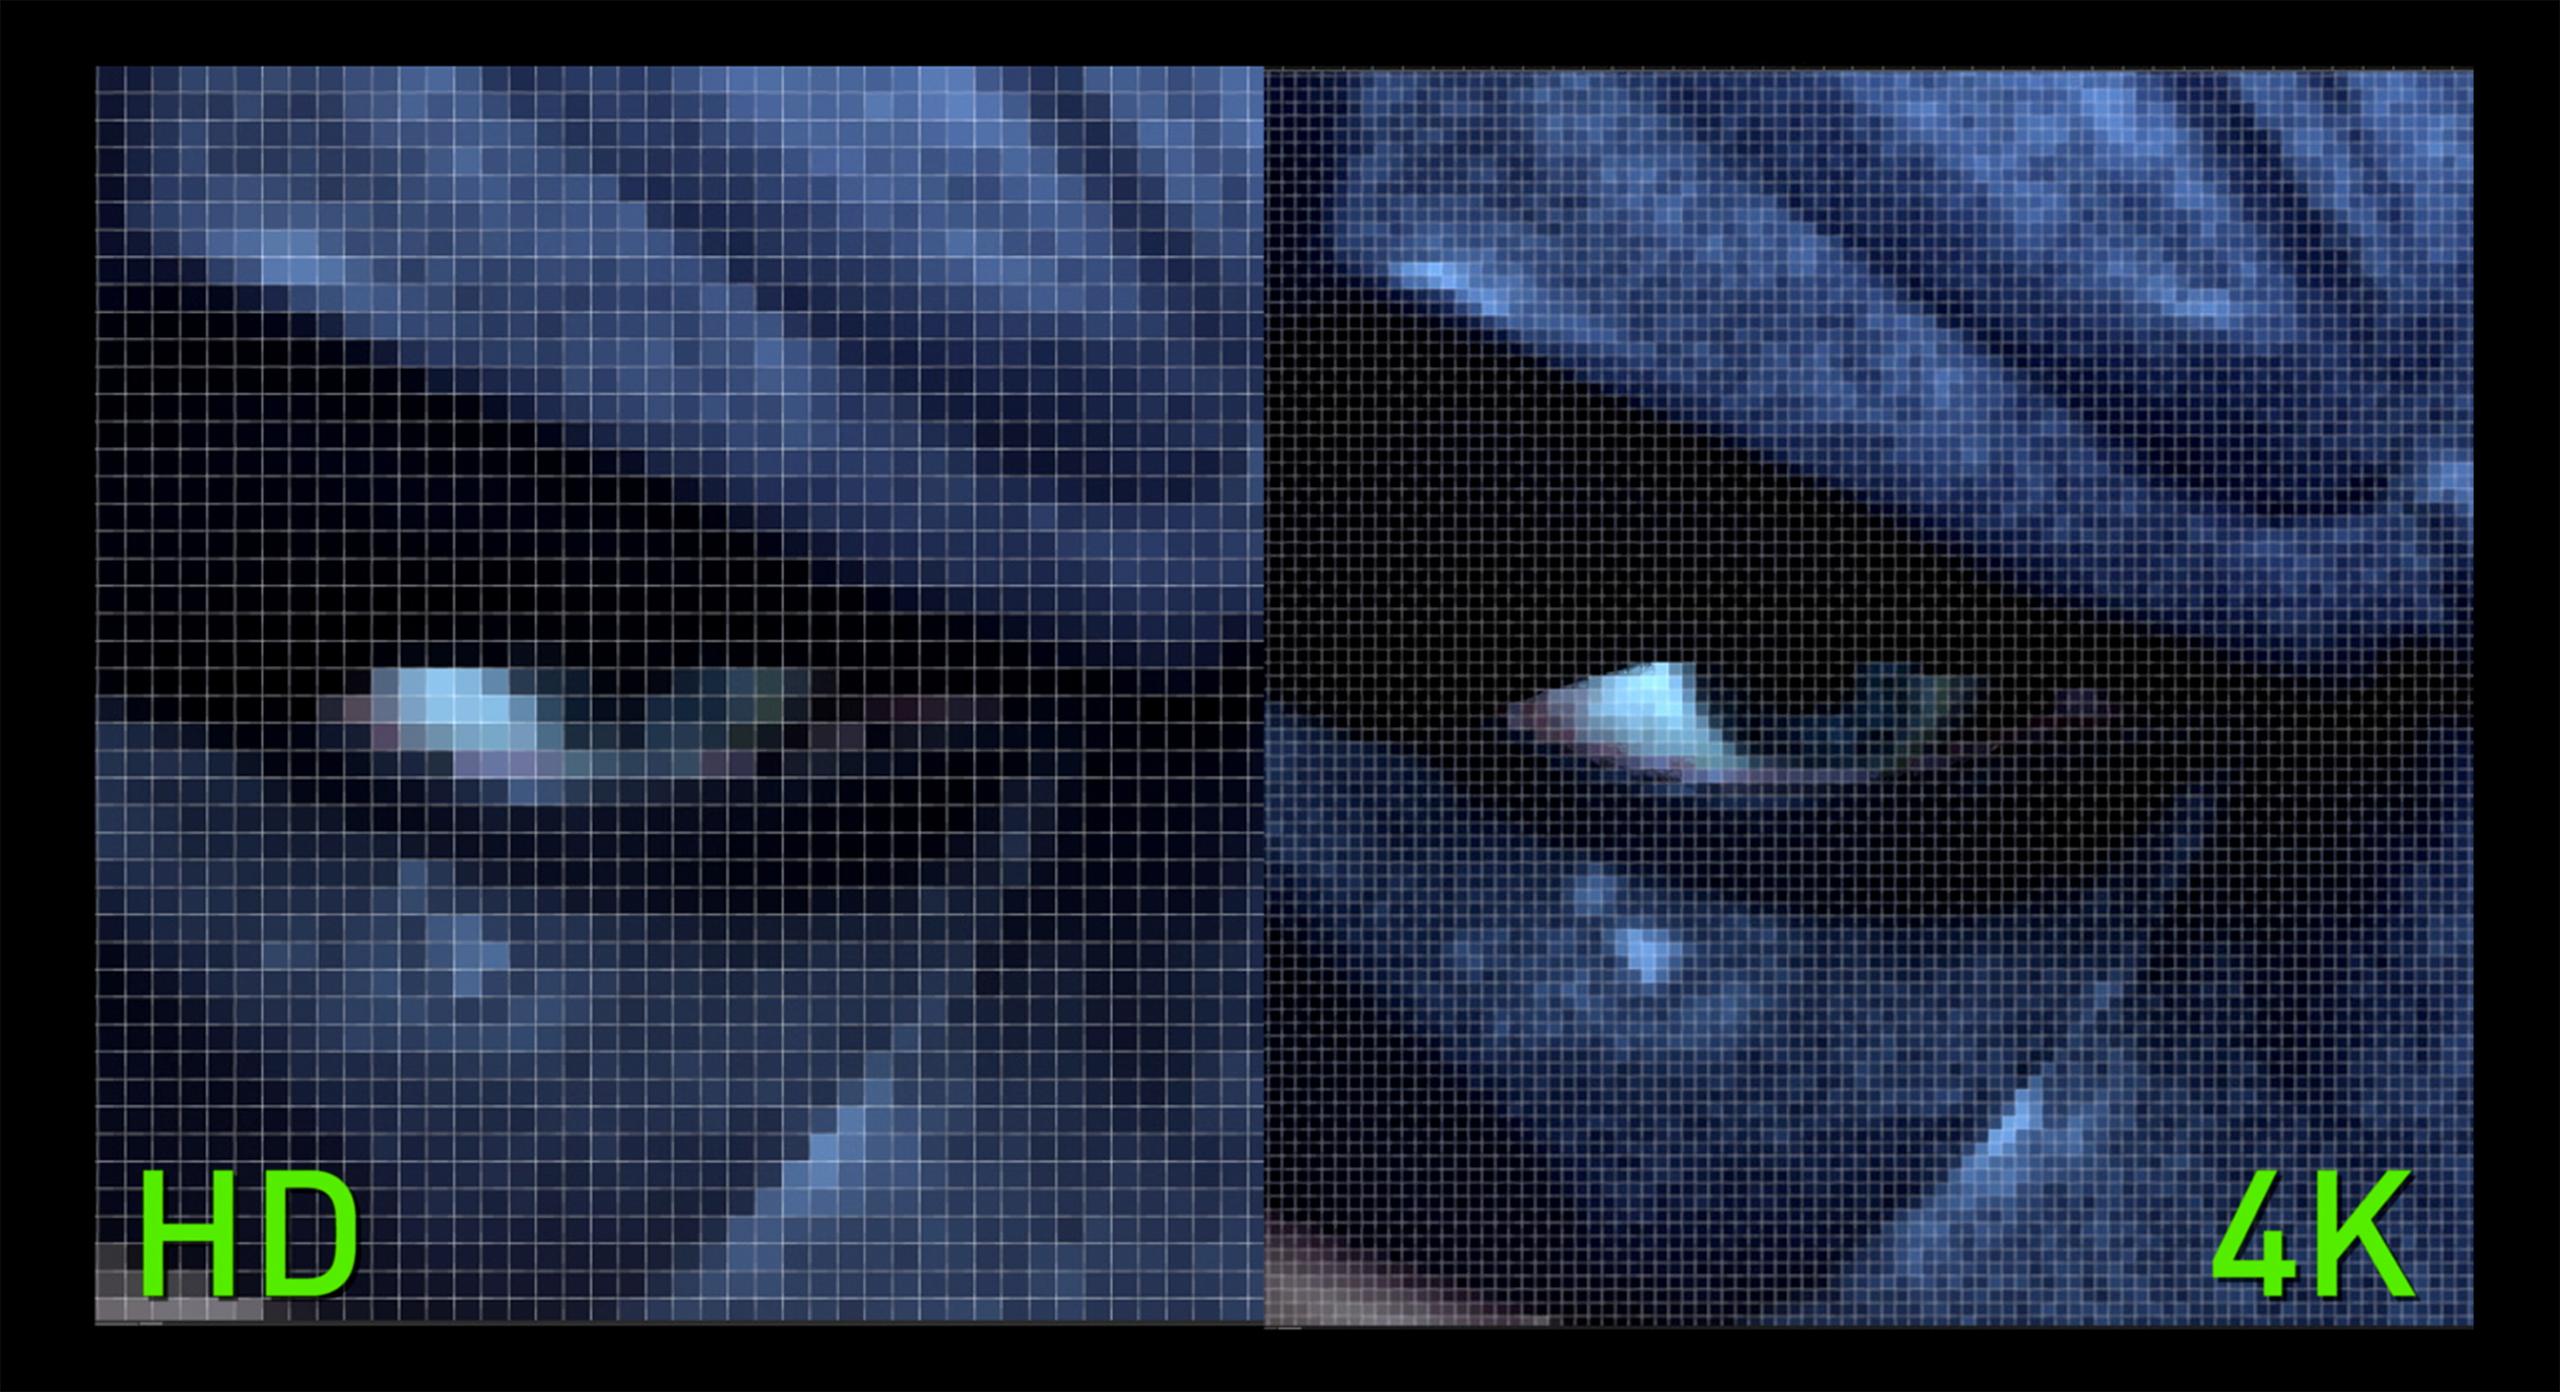 nvidia geforce gtx 4k batman arkham origins 4k versus hdjpg 2560x1392